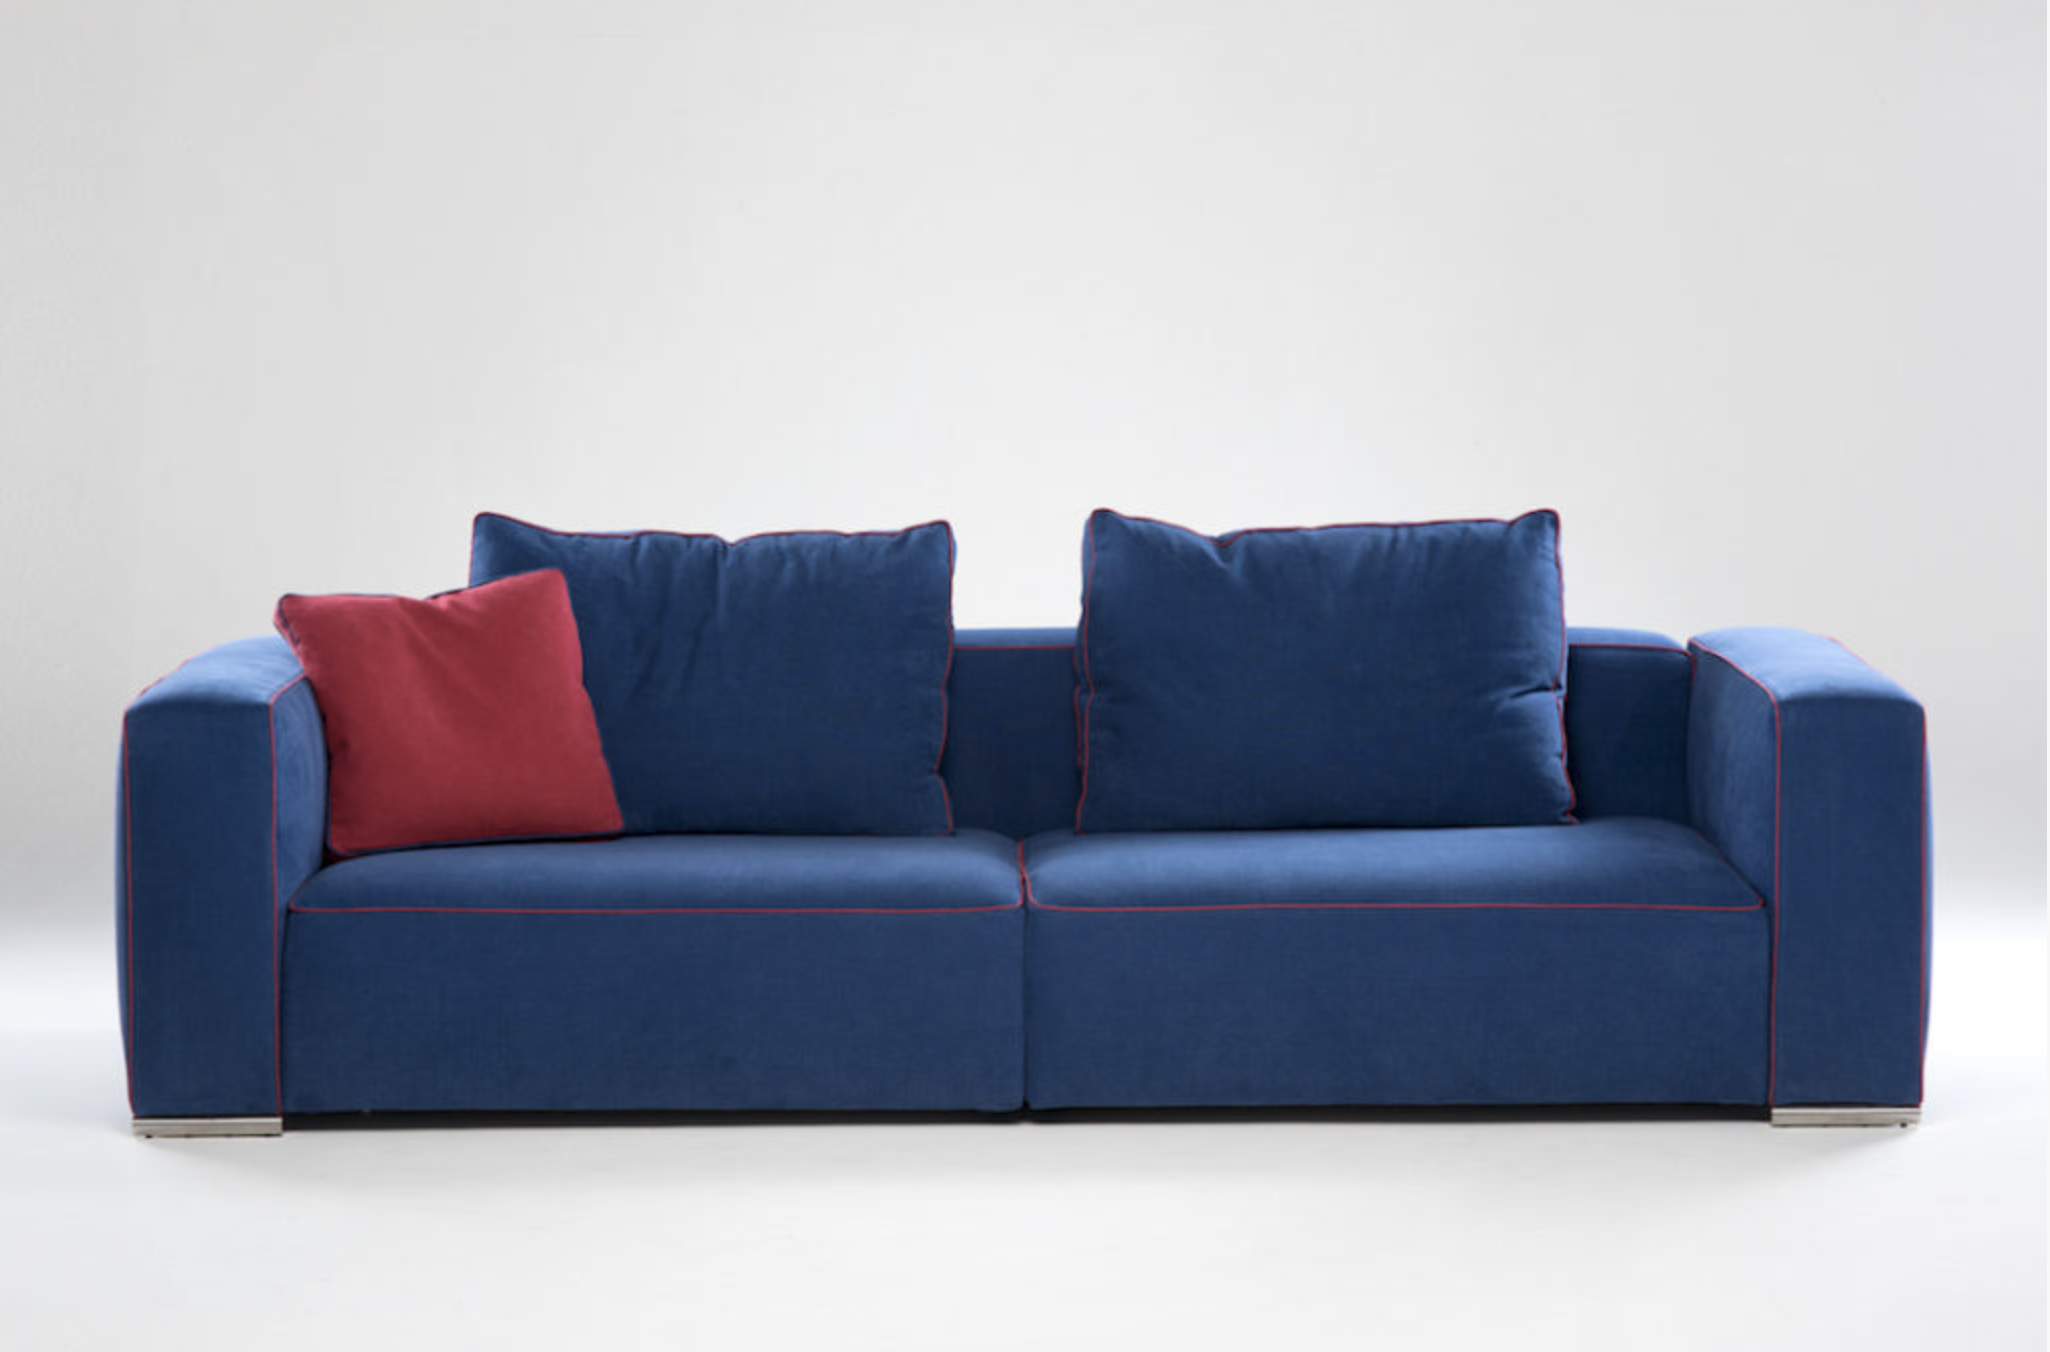 Sof 224 Italian Modern Sofa Tailor Made